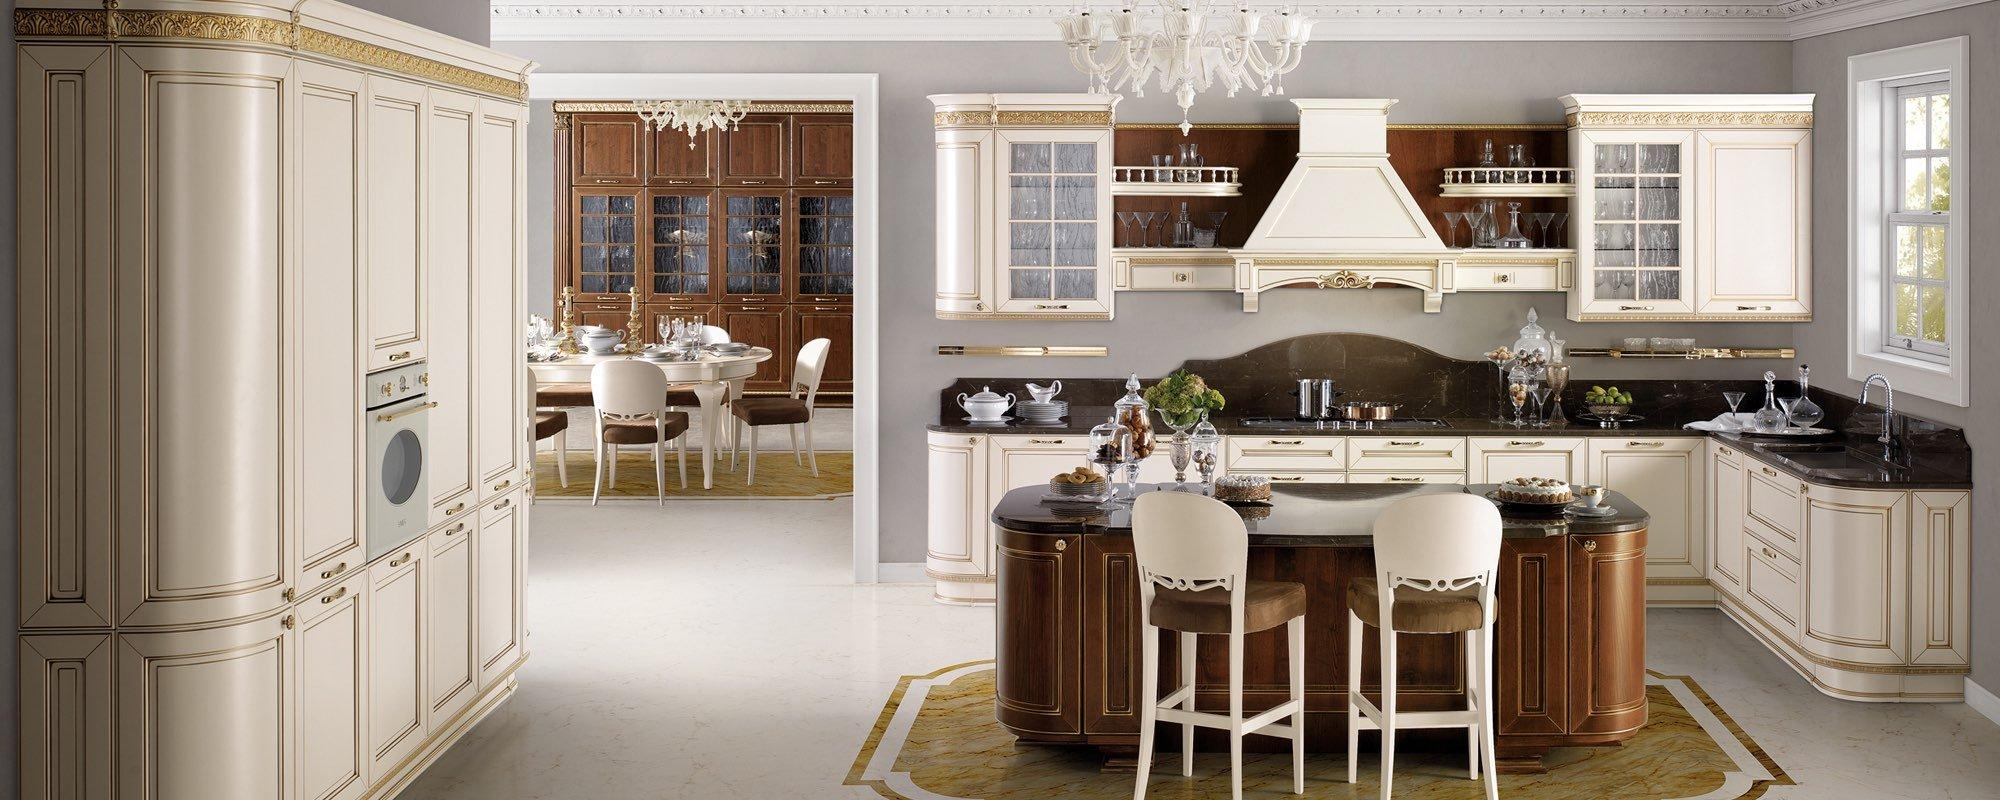 vista interna di una cucina con arredamenti -Dolcevita